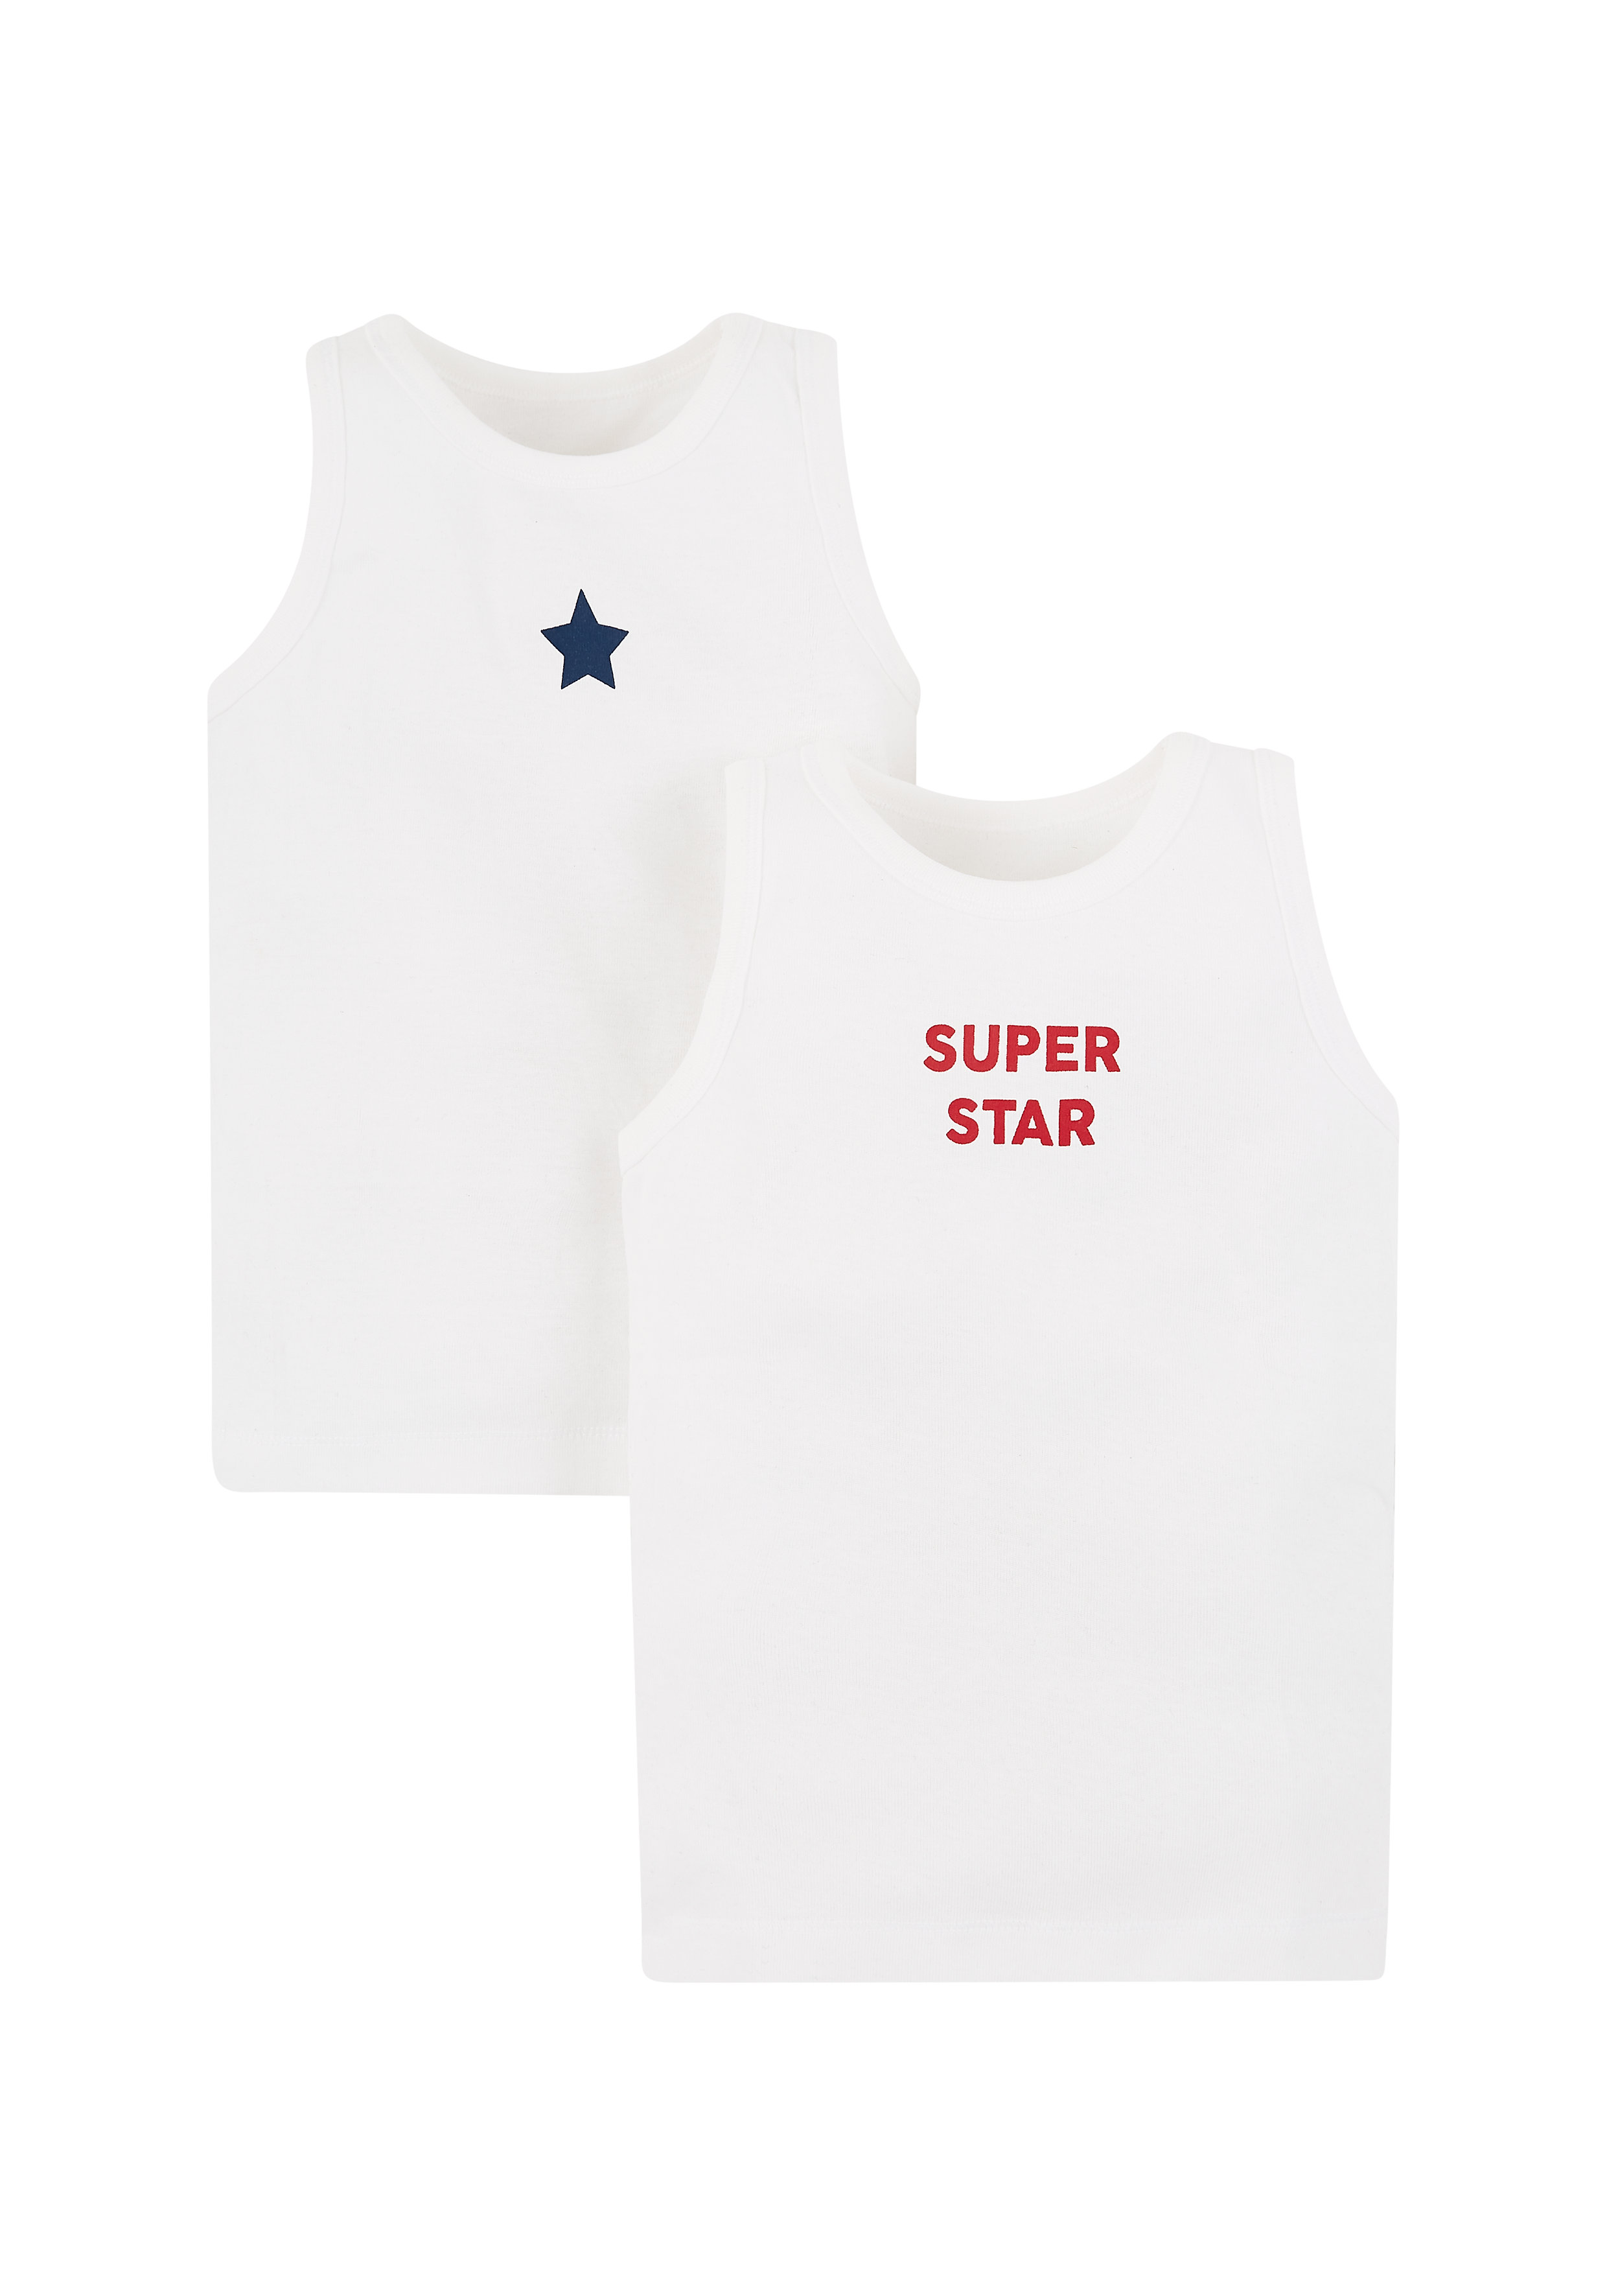 Mothercare   Boys Super Star Vests - 2 Pack - White